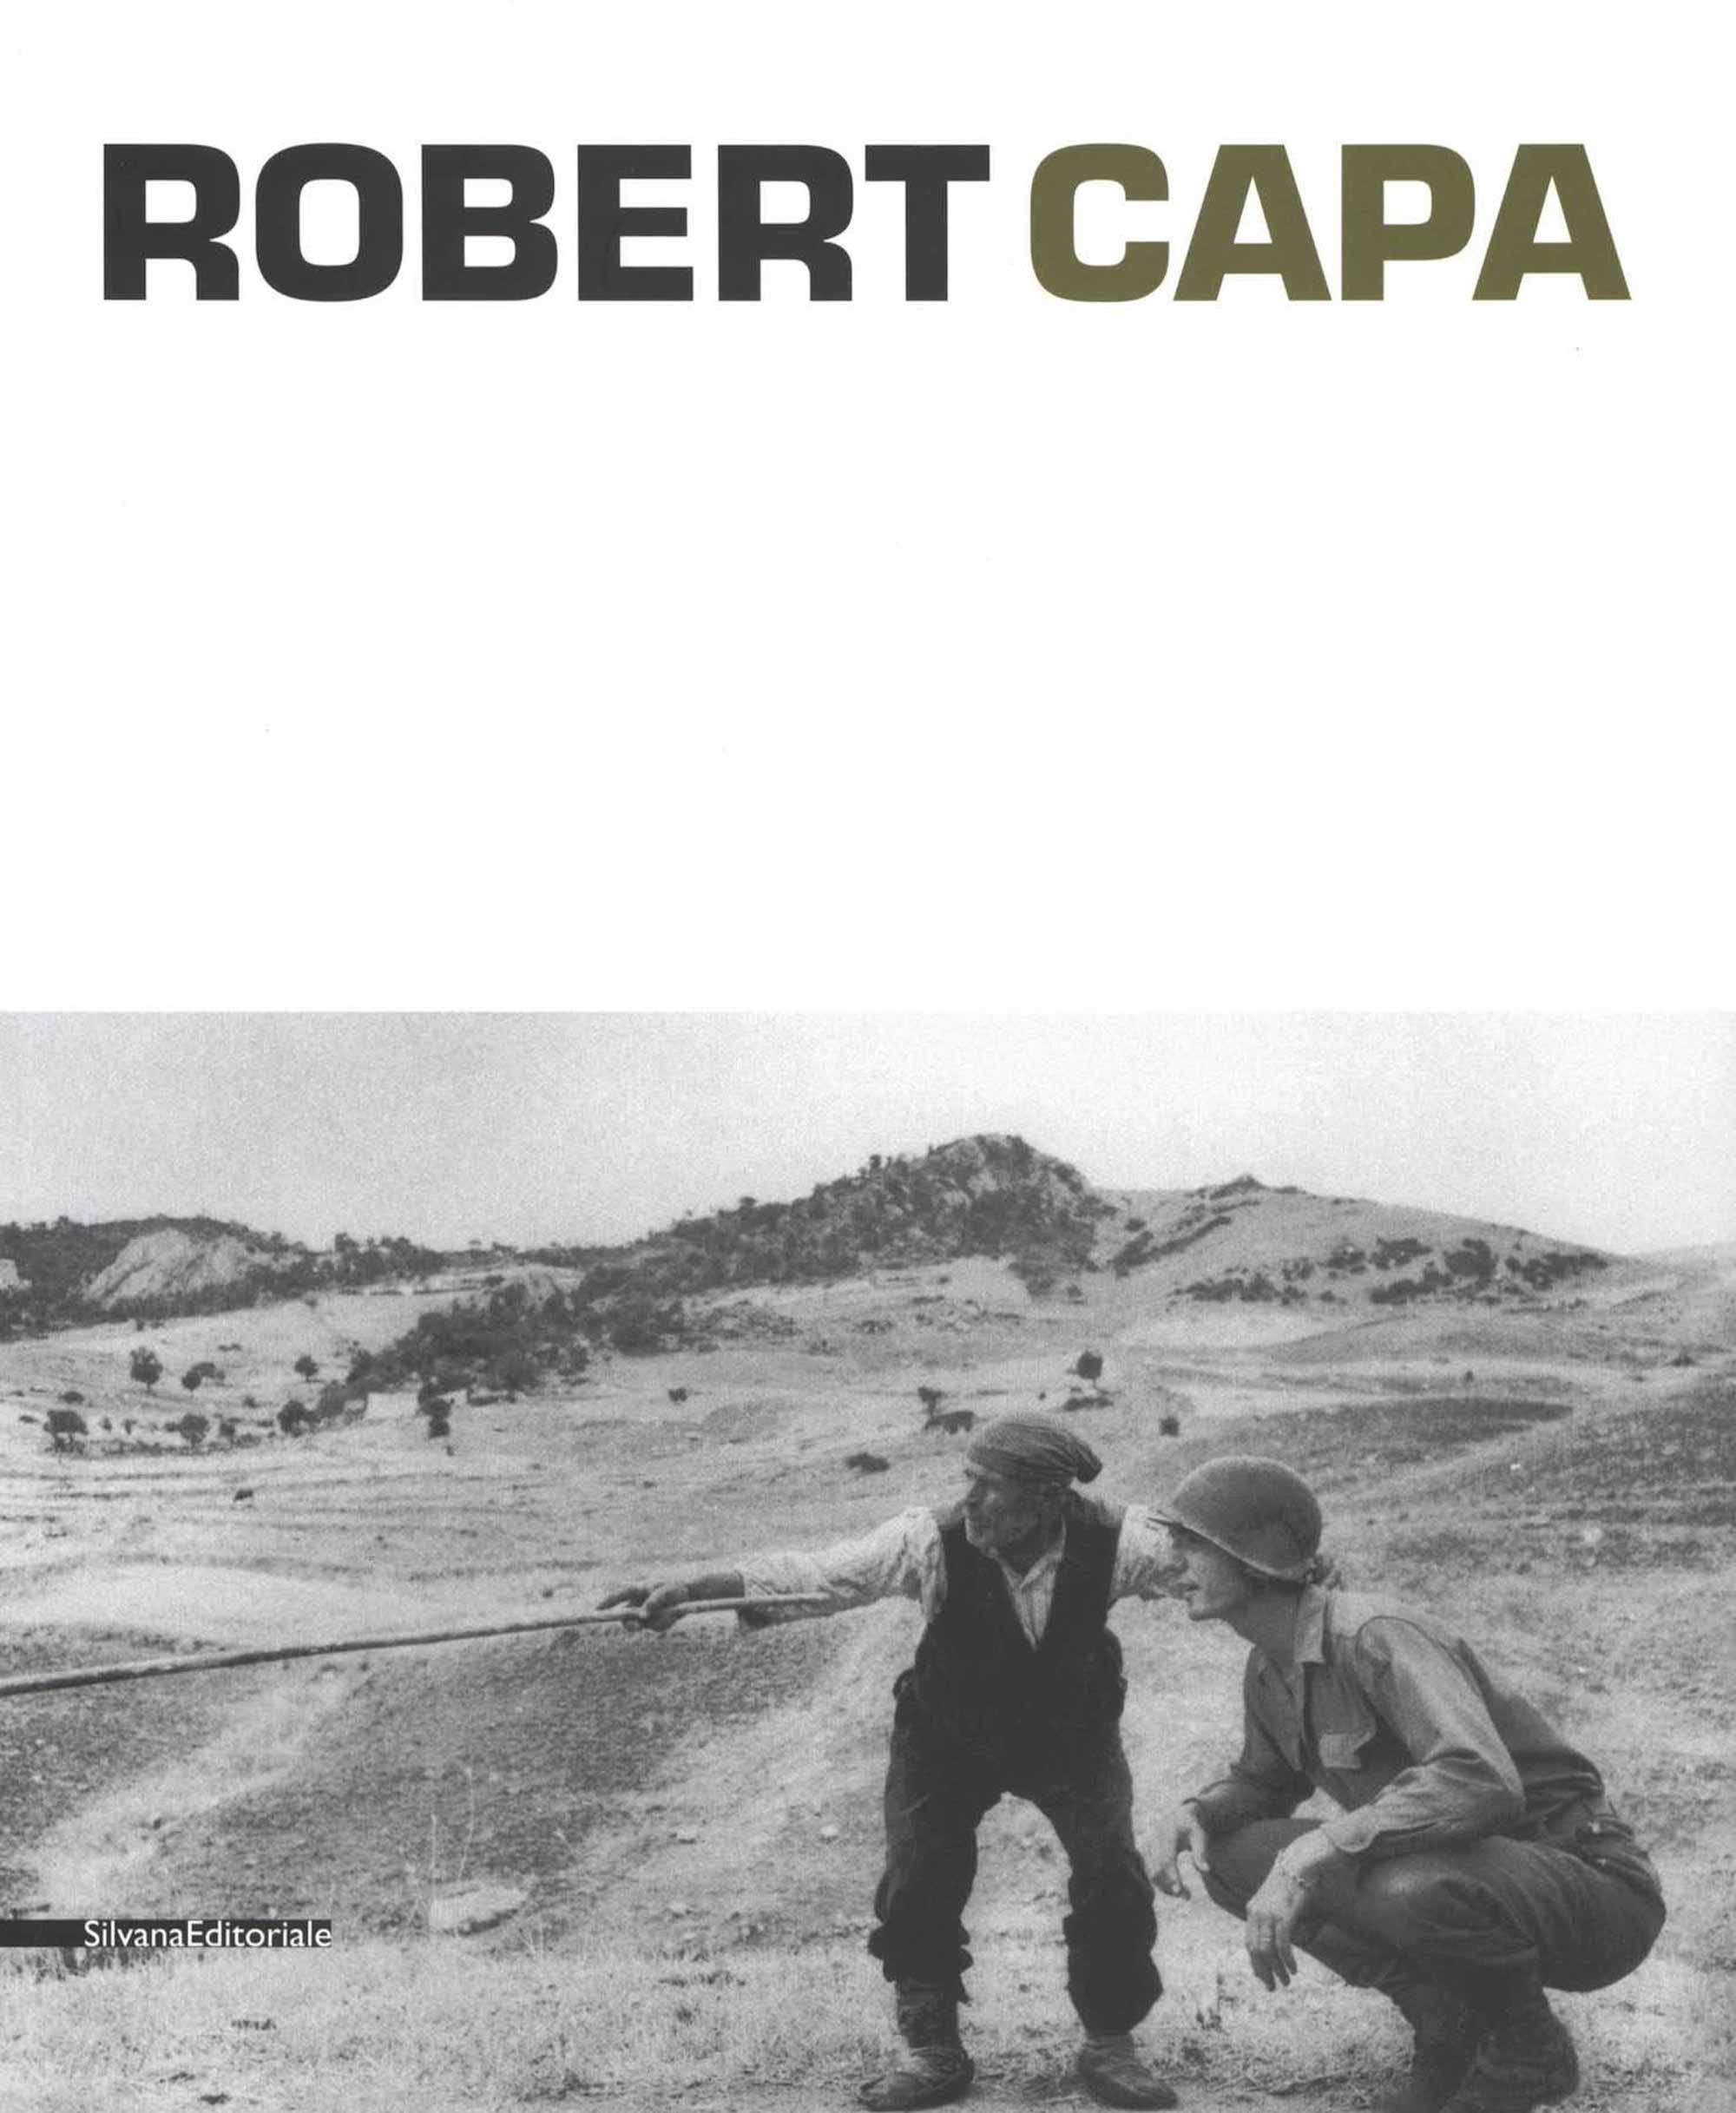 Libri-Robert-Capa-bianco-e-nero